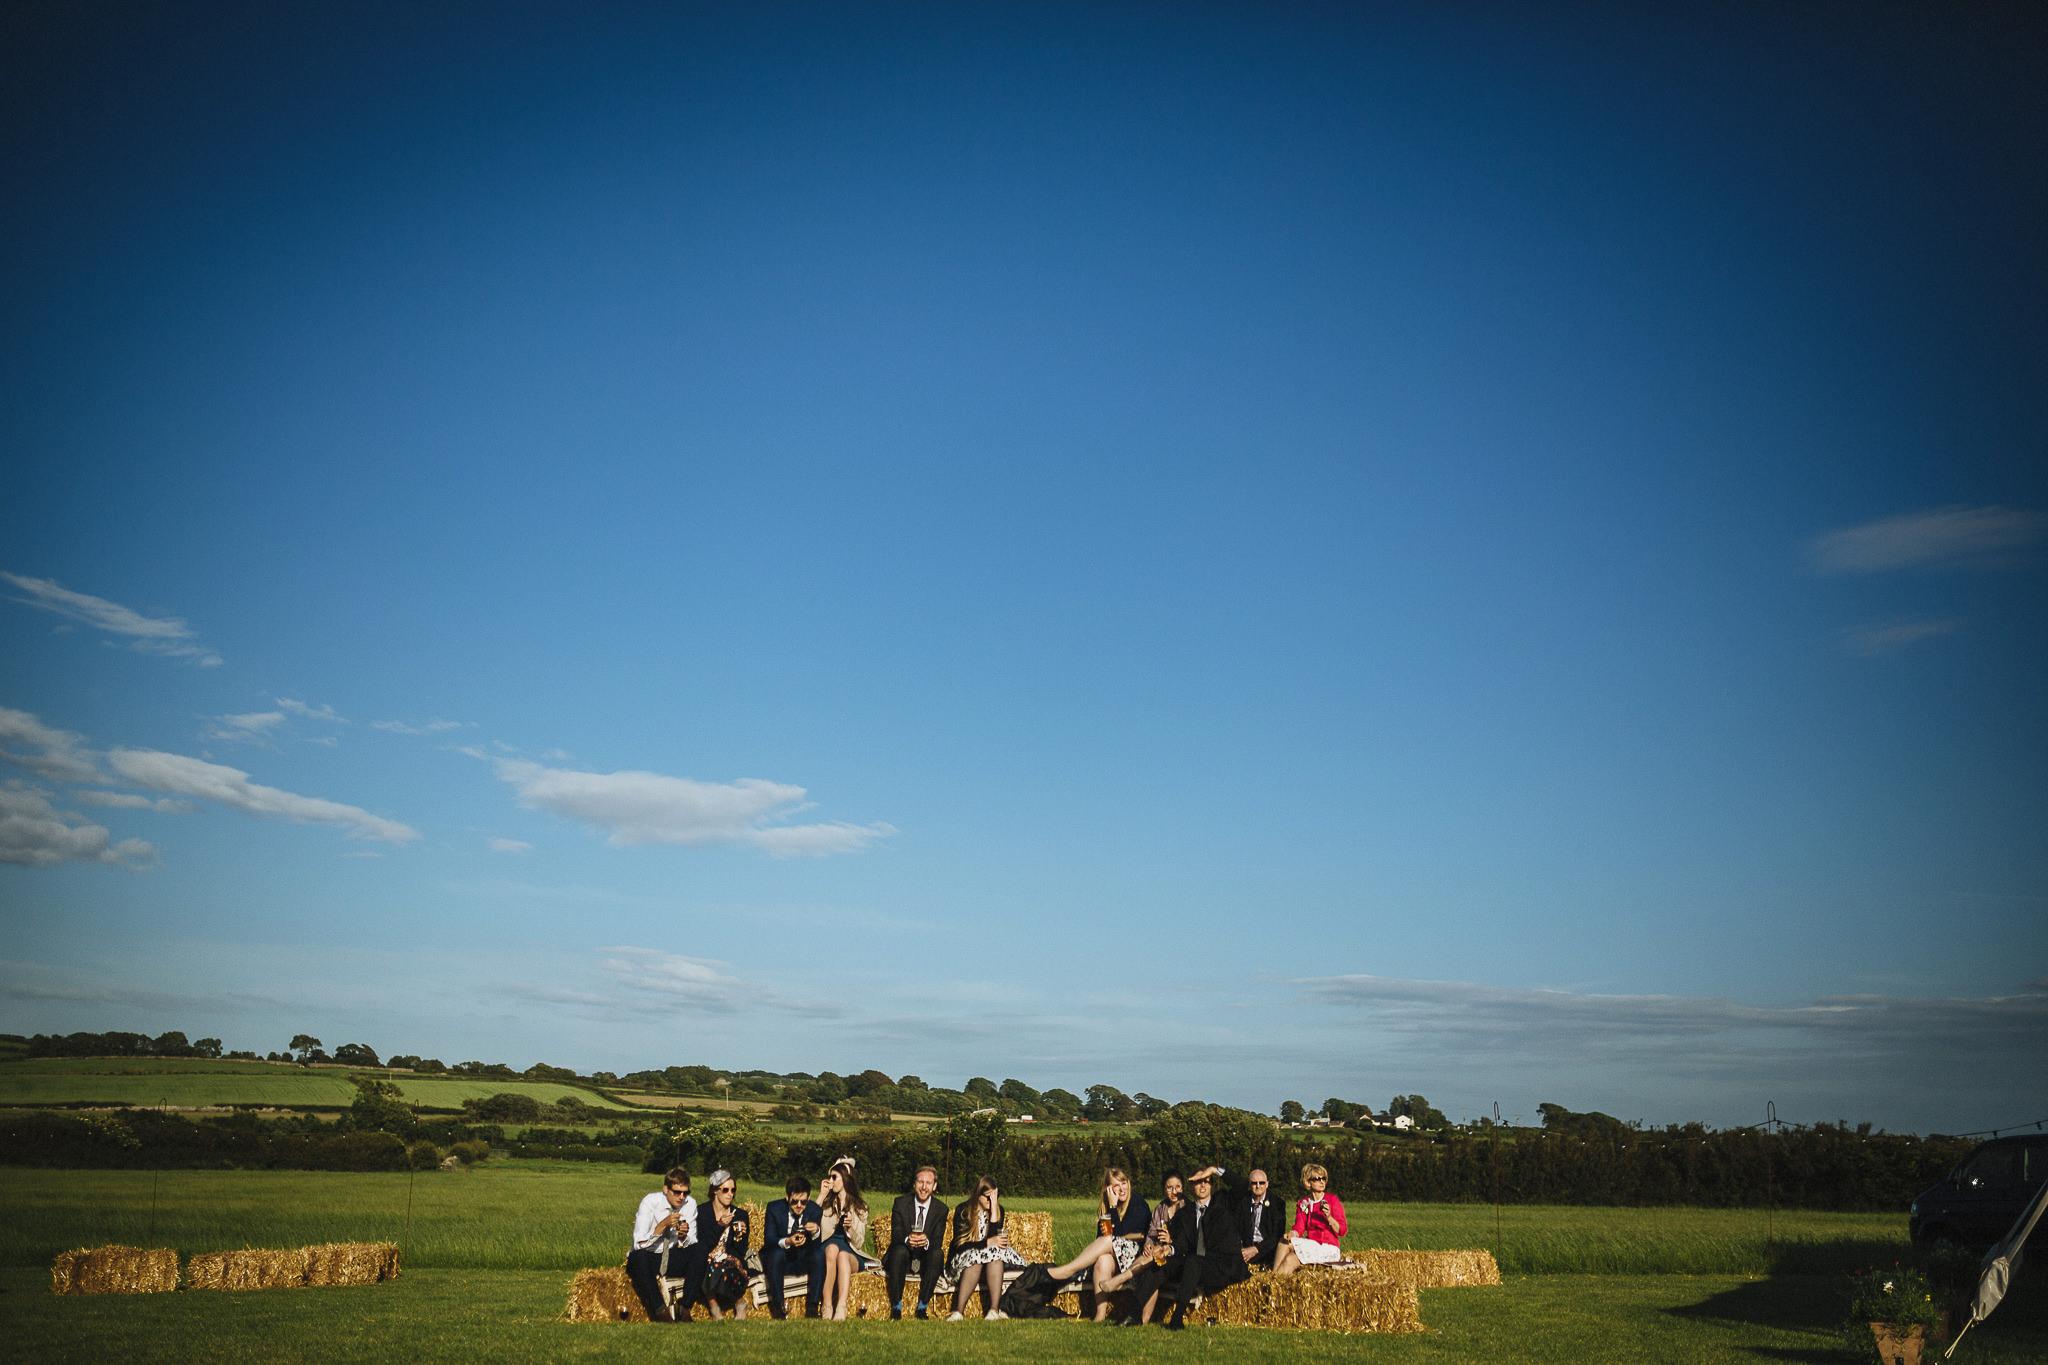 paul-marbrook-Farm-Wedding-Photographer-Lancashire-90072